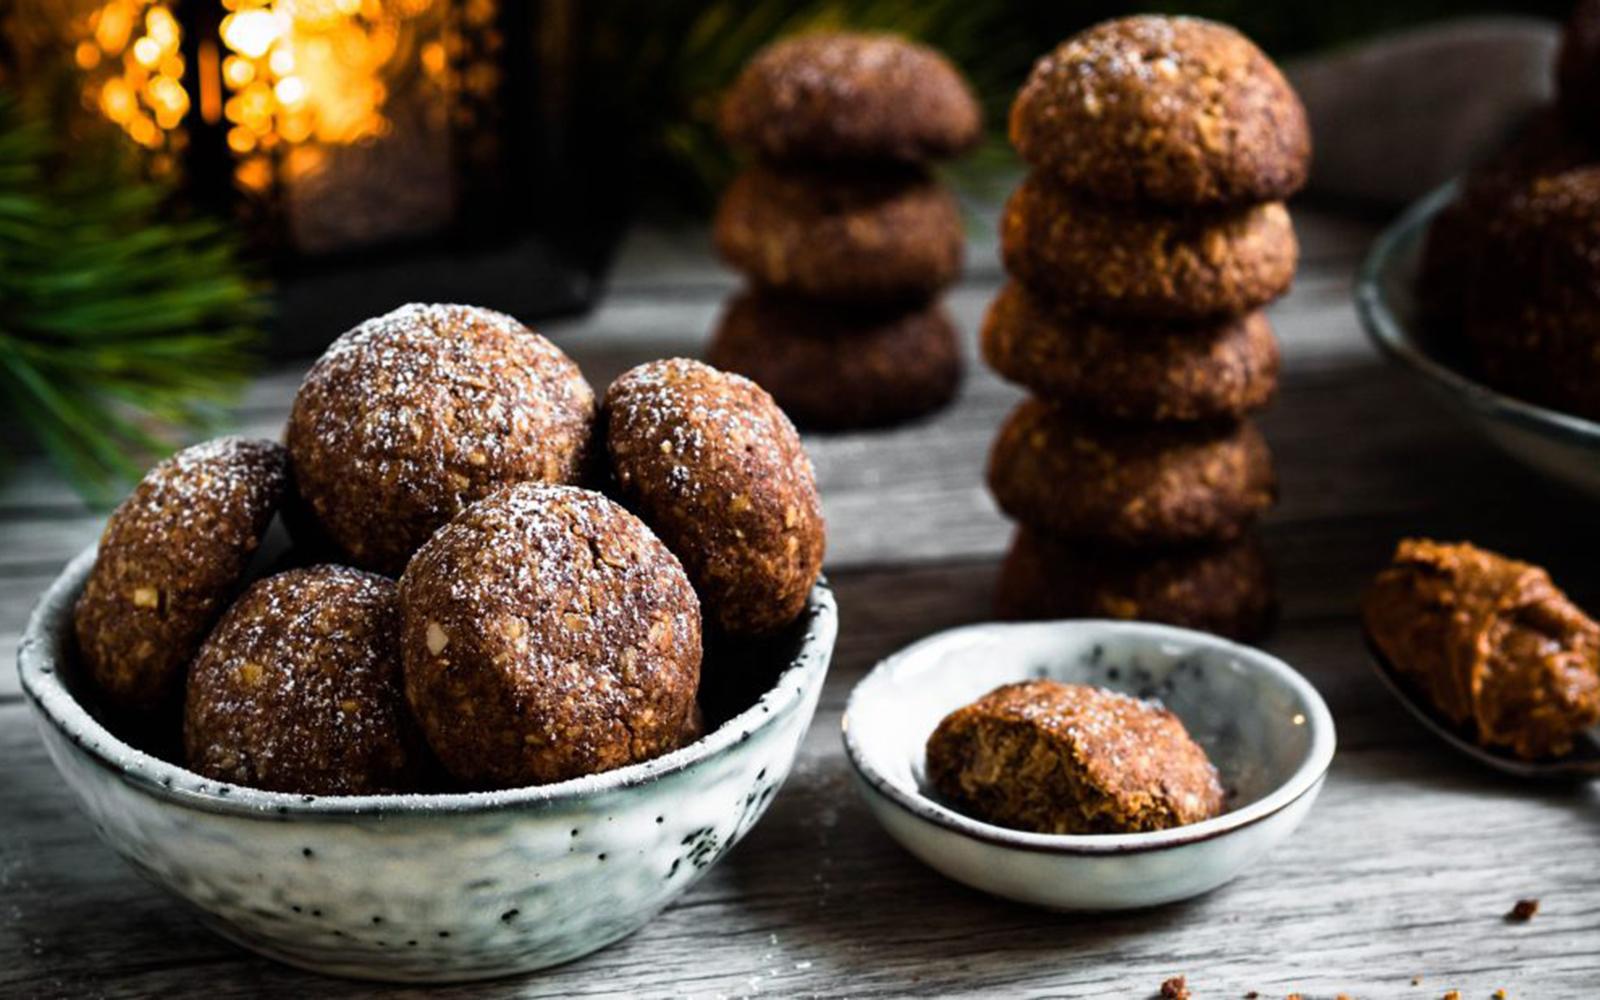 Teff Peanut Butter Cookies [Vegan, Gluten-Free]